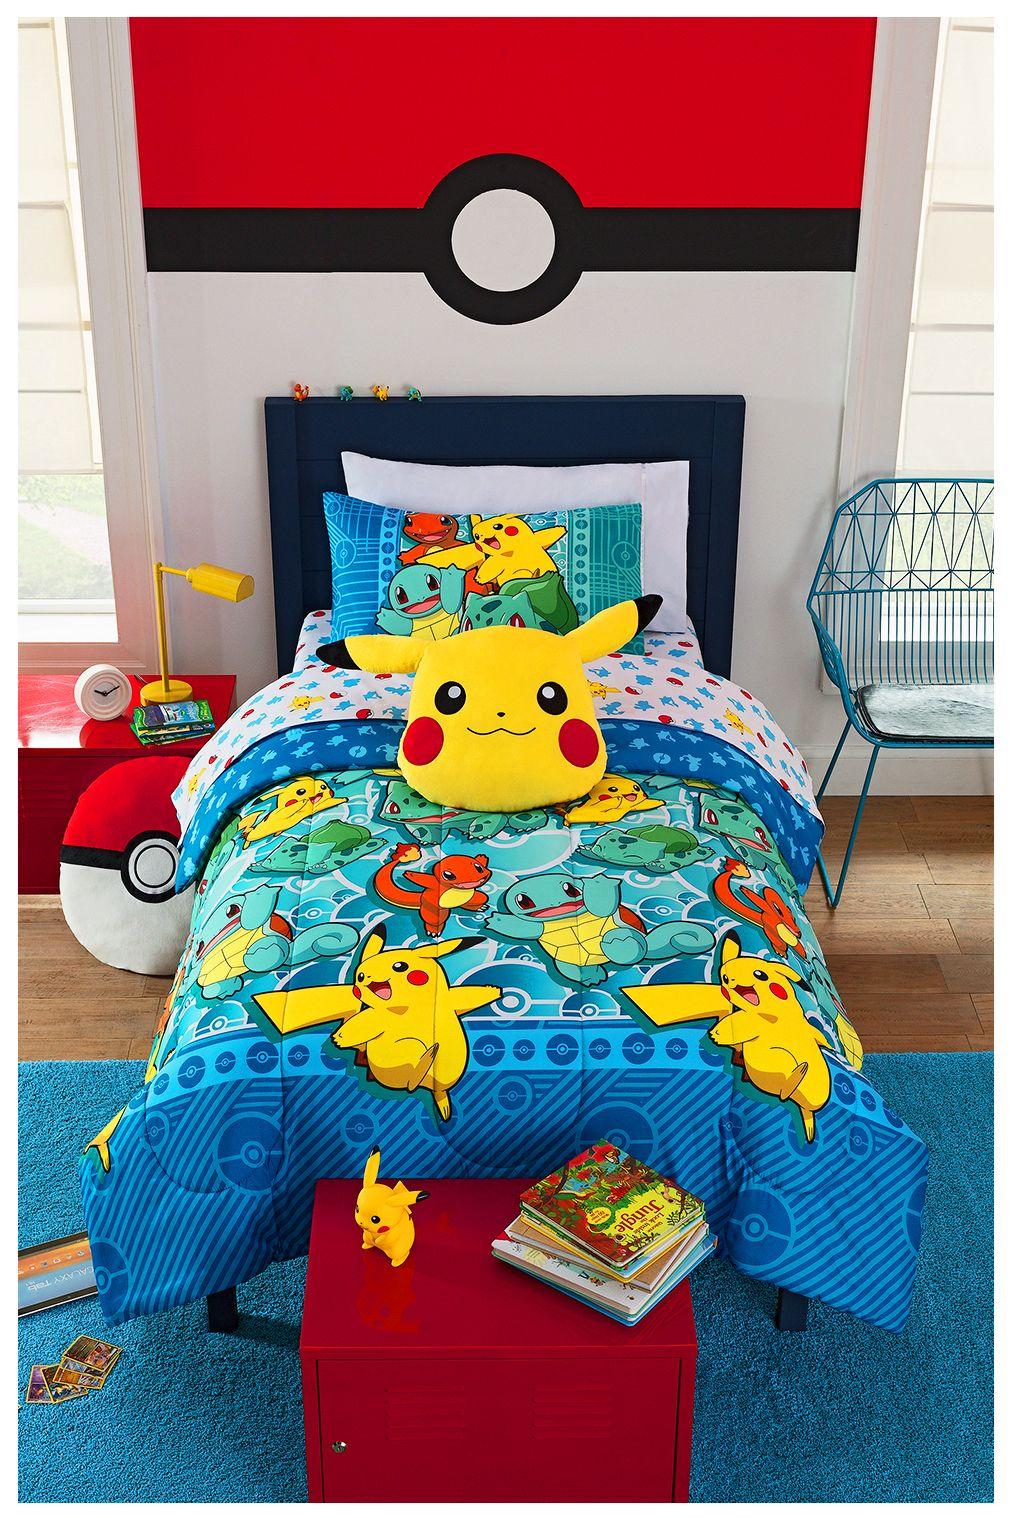 Anime Bedroom Ideas In 2020 20 Minimalist Ideas Decorations Kids Comforters Pokemon Room Gold Bedroom Decor